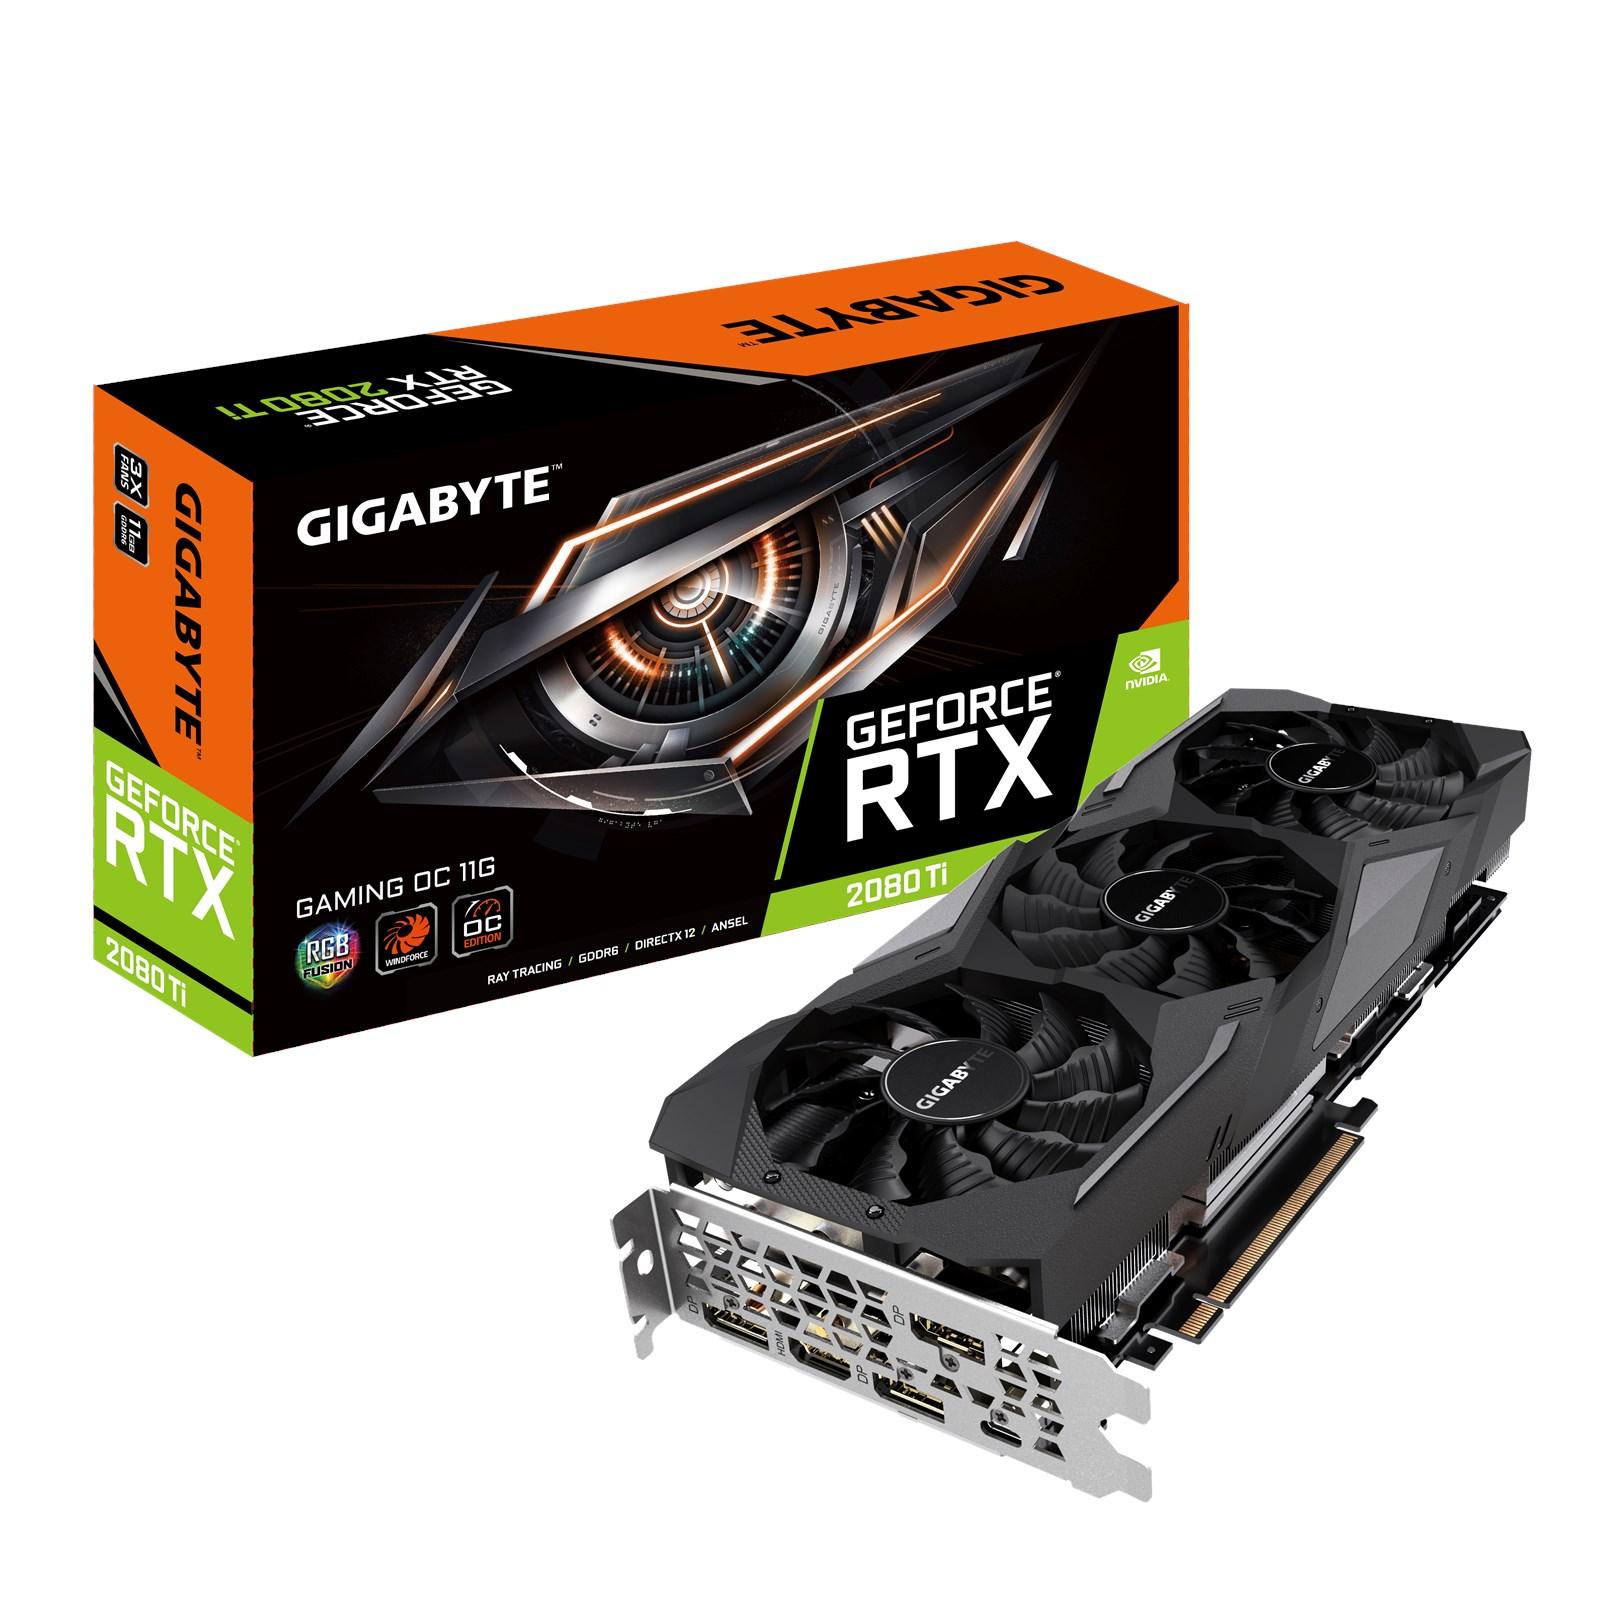 Gigabyte GeForce RTX 2080 Ti GAMING 11GB - GV-N208TGAMING OC